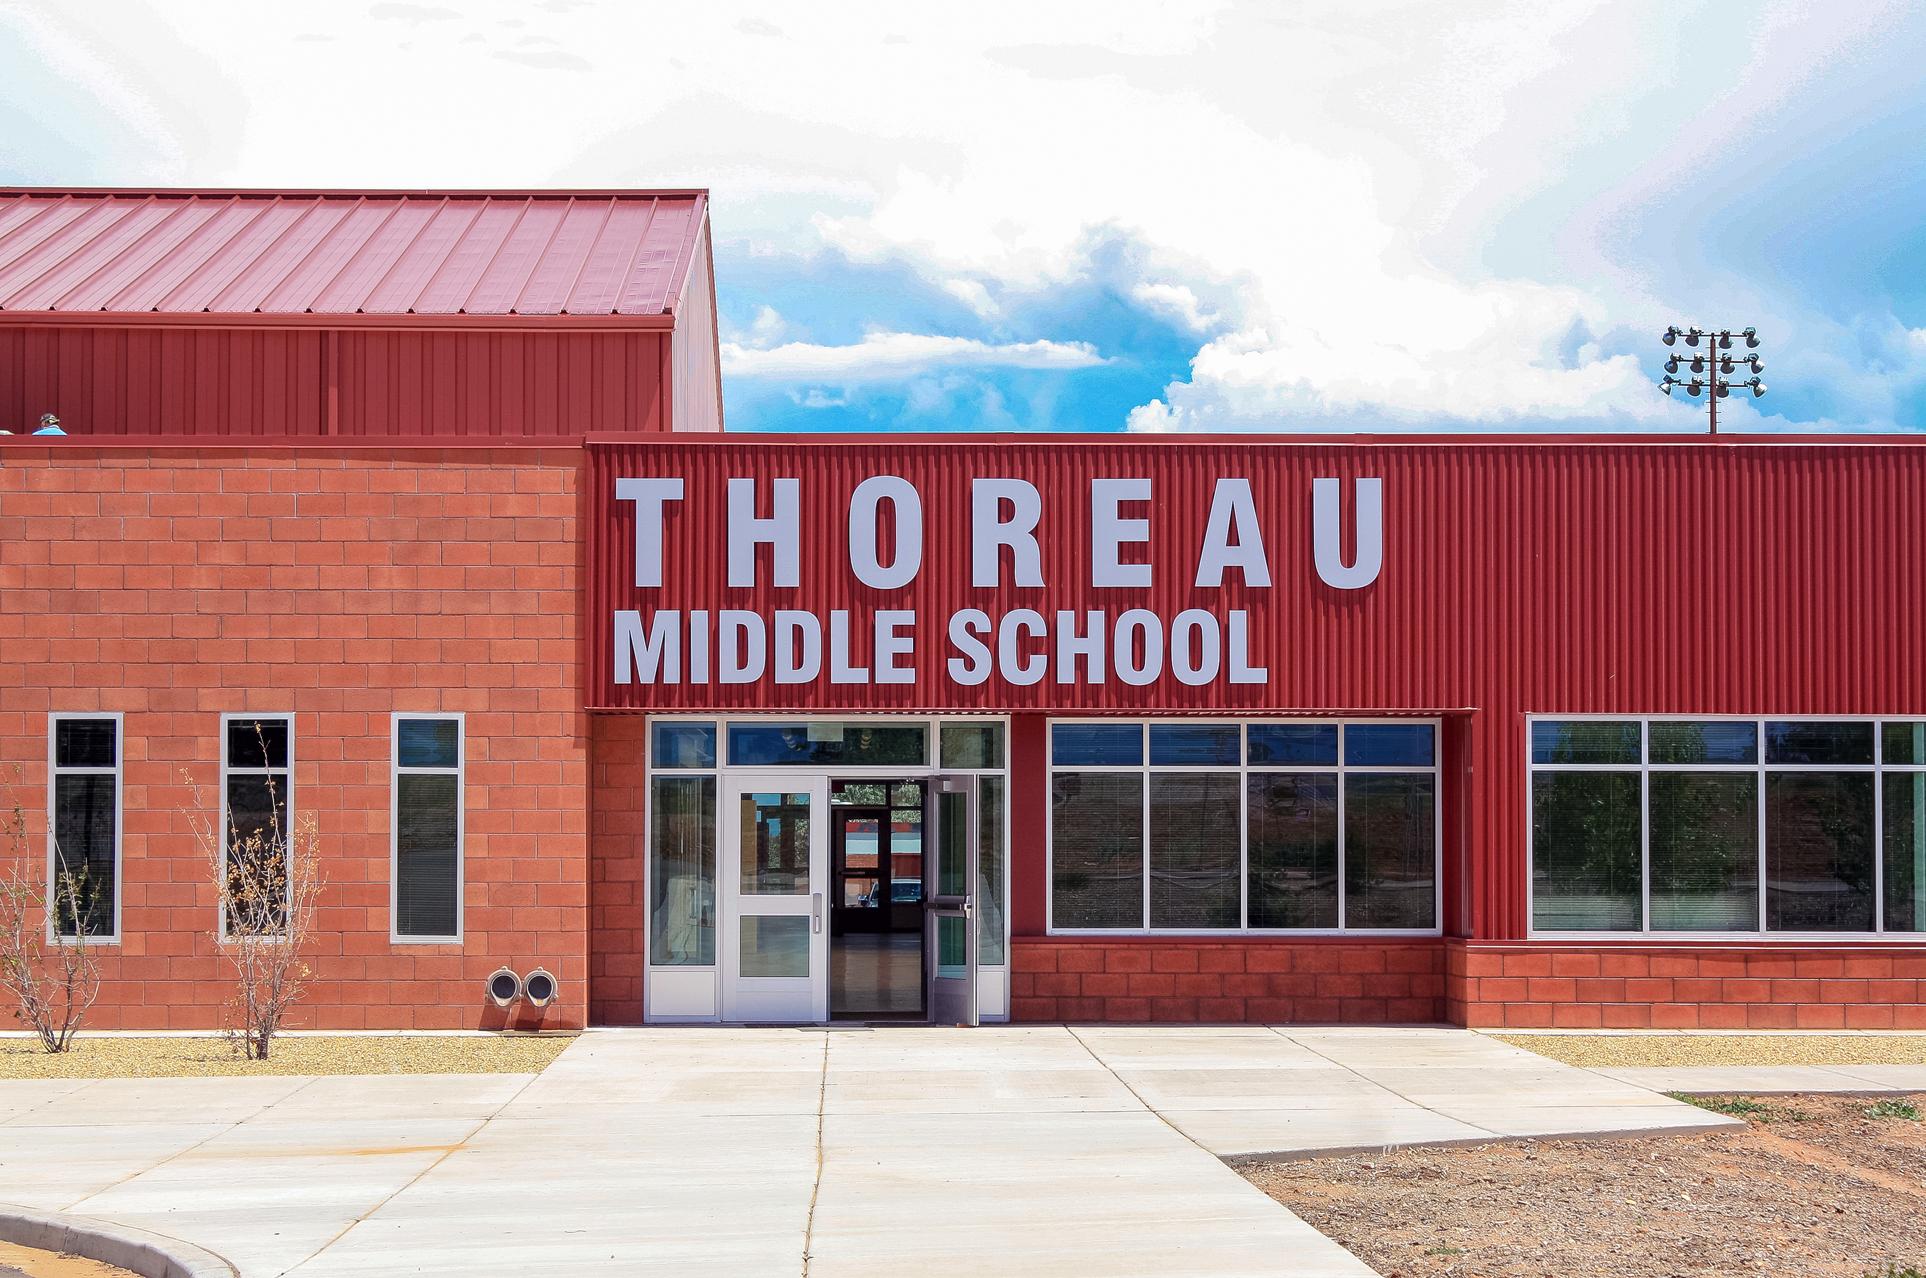 Thoreau Middle School